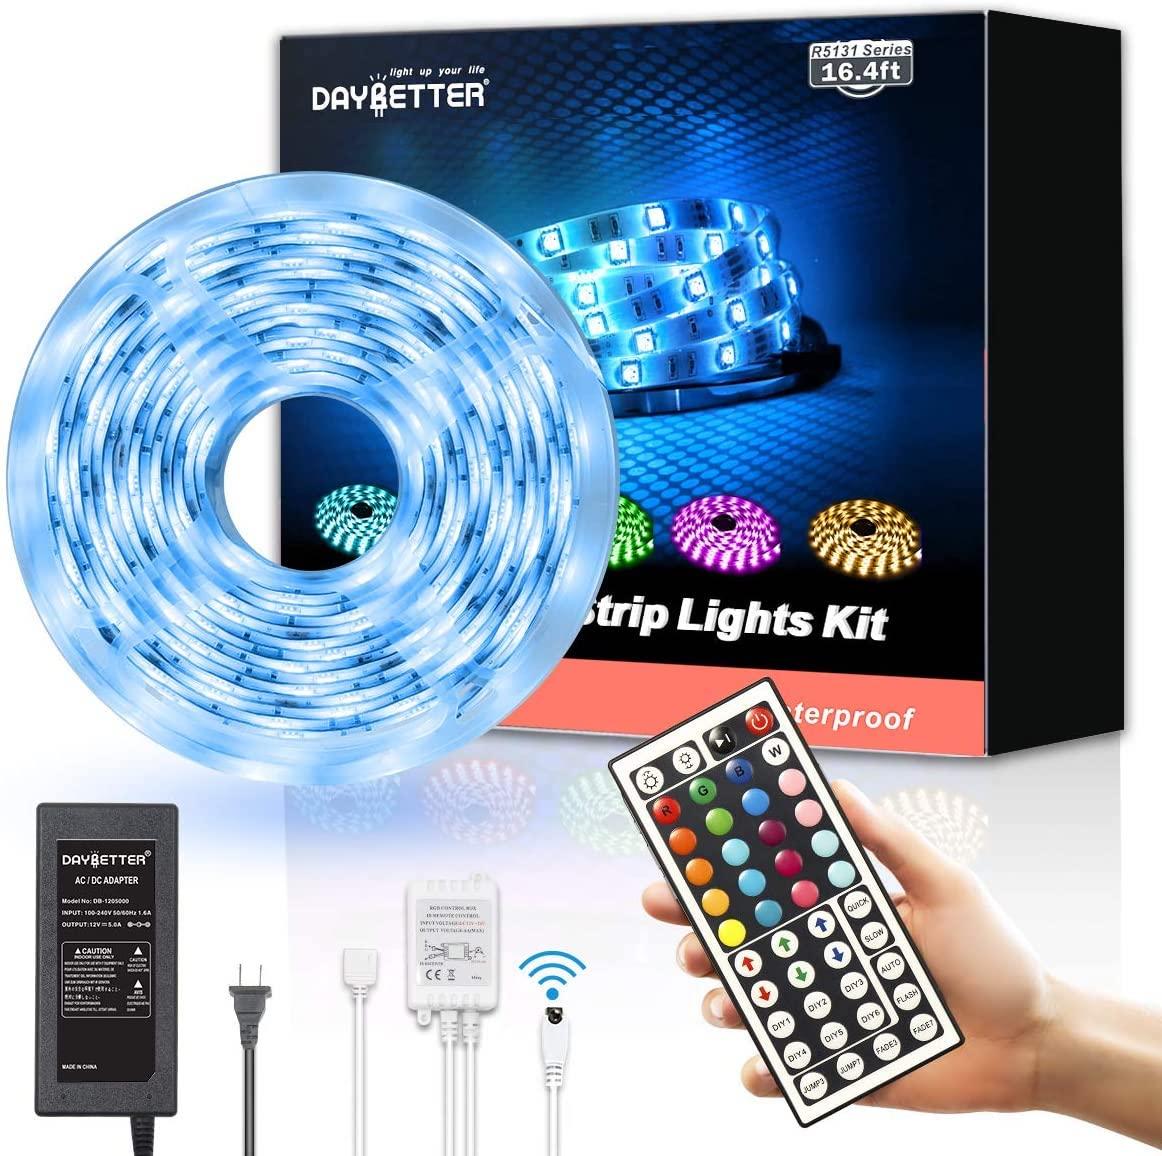 DAYBETTER Waterproof LED Strip Lights